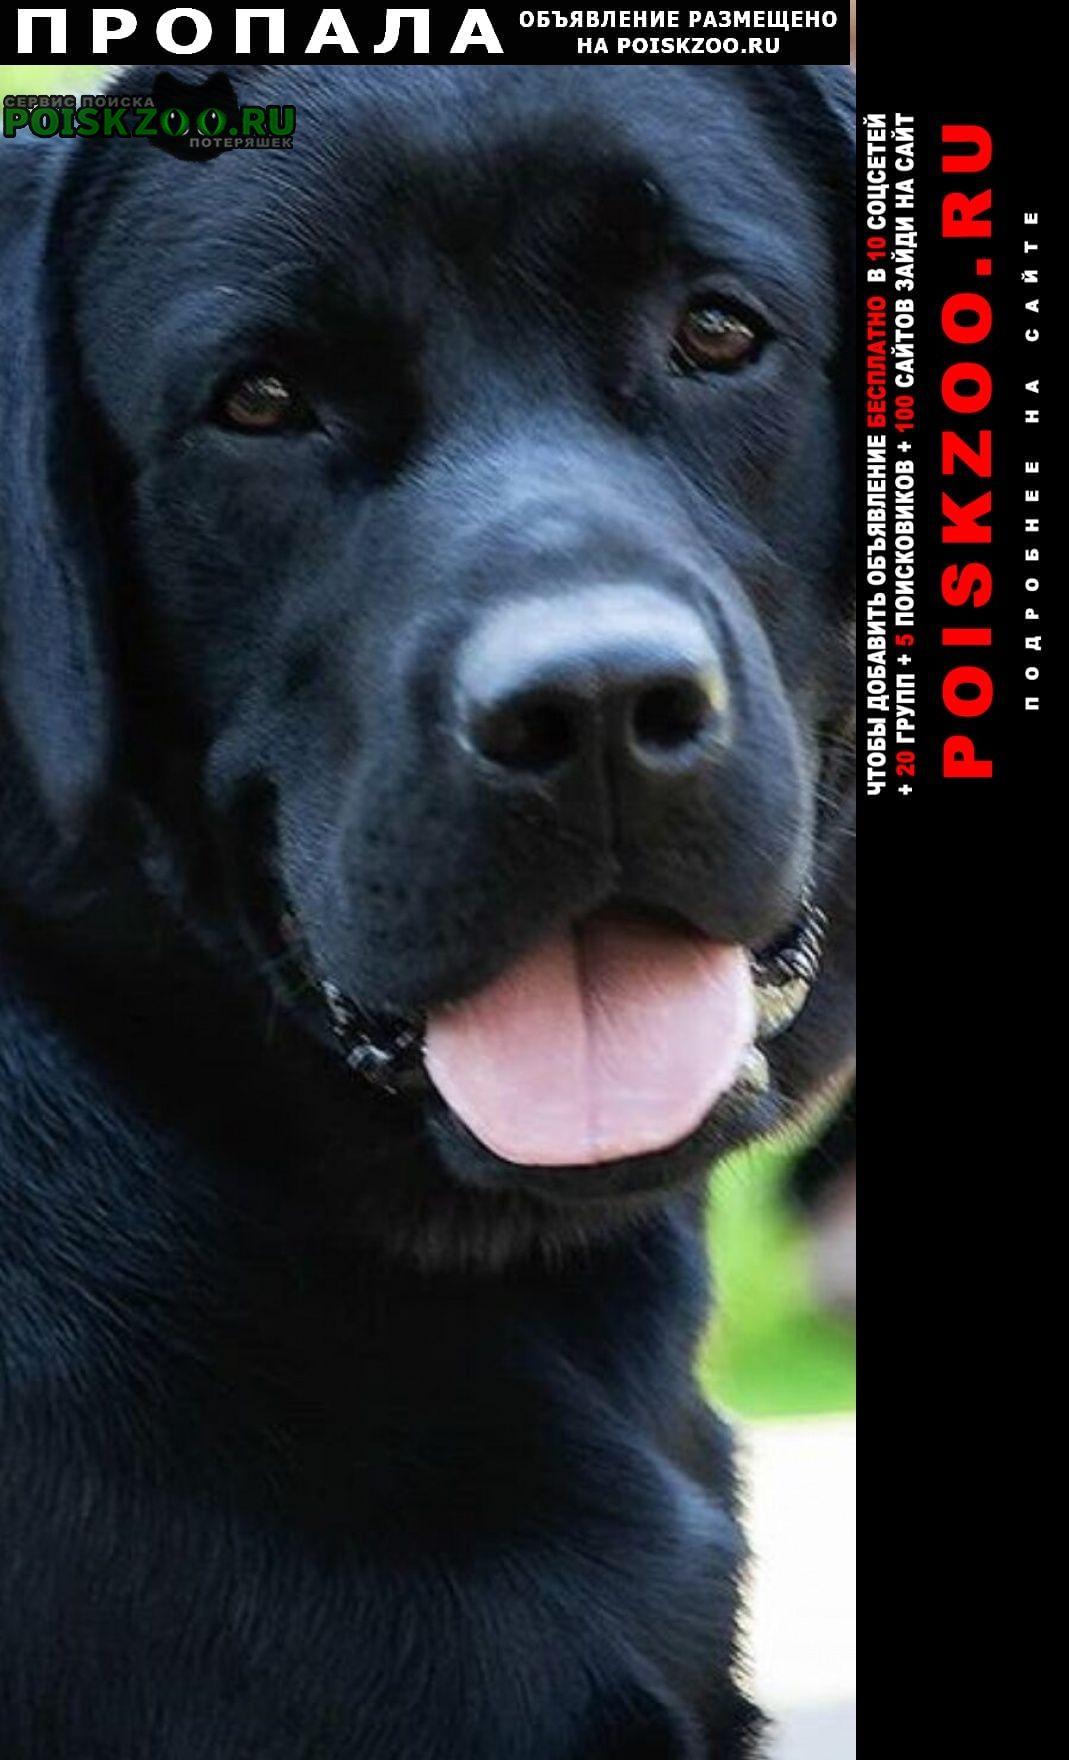 Пропала собака кобель попал лабрадор Сочи